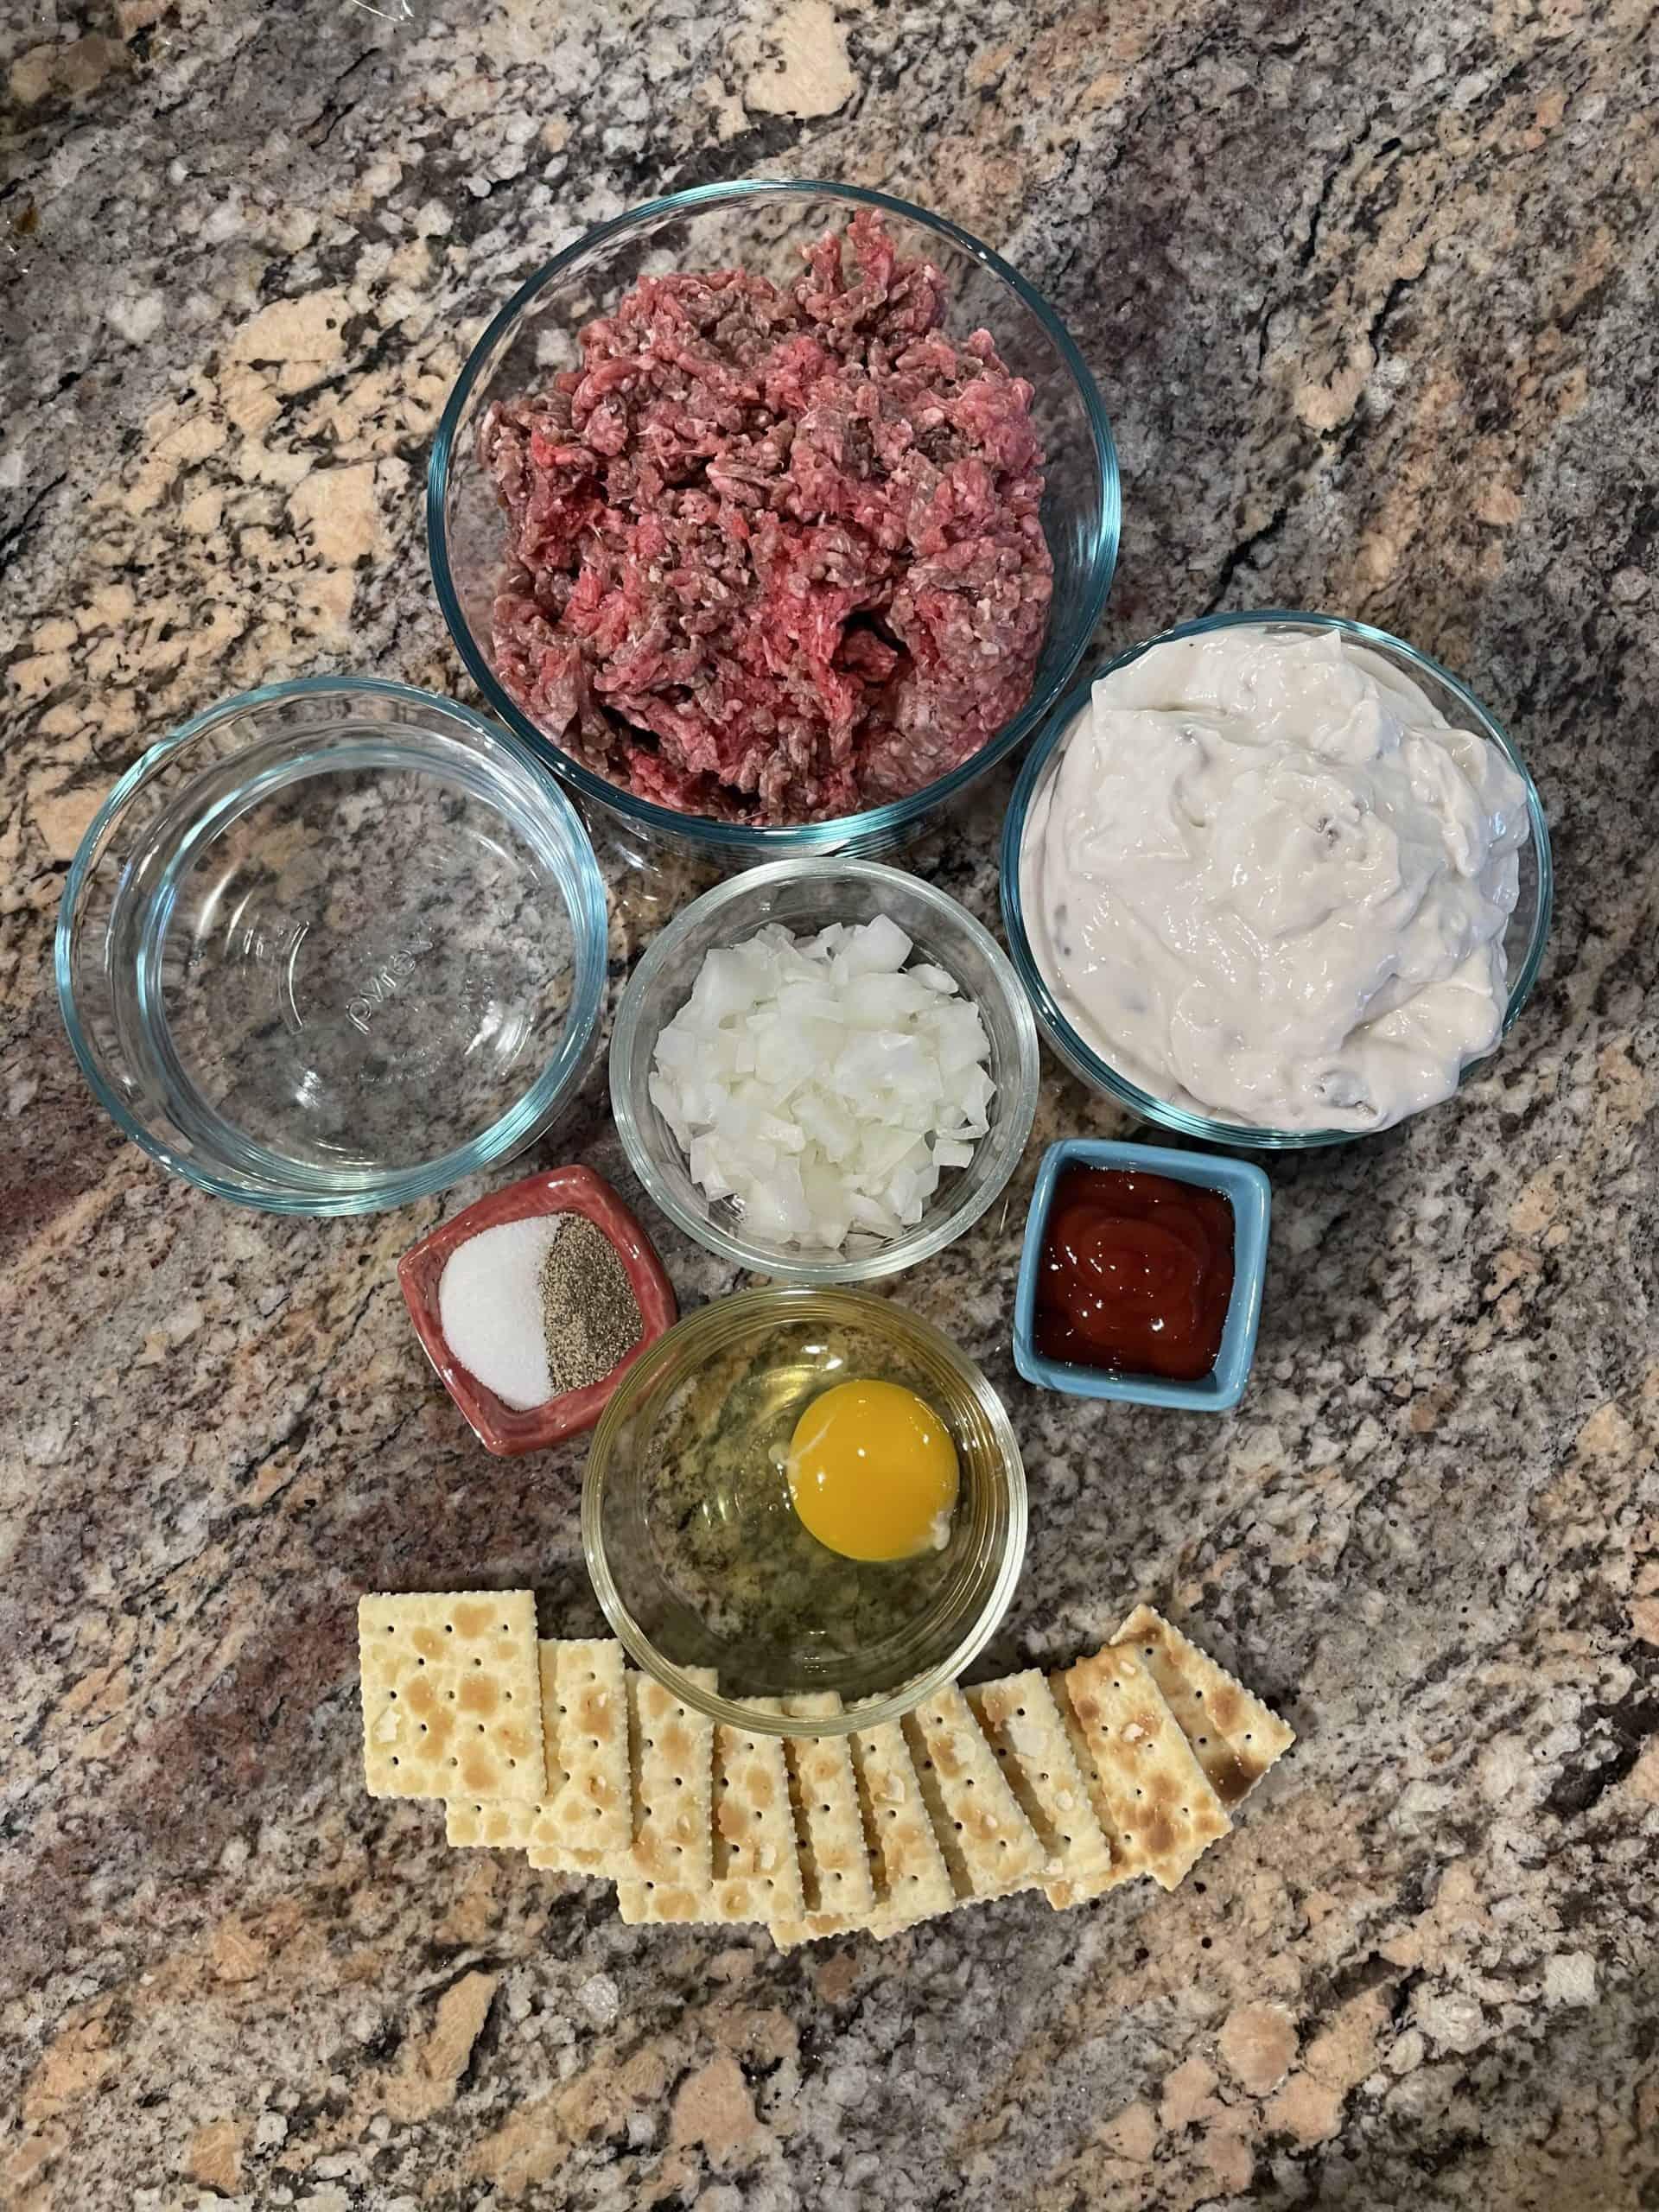 Swedish Meatball Recipe Ingredients - hamburger, diced onion, egg, saltine crackers, ketchup, cream of mushroom soup, salt and pepper.